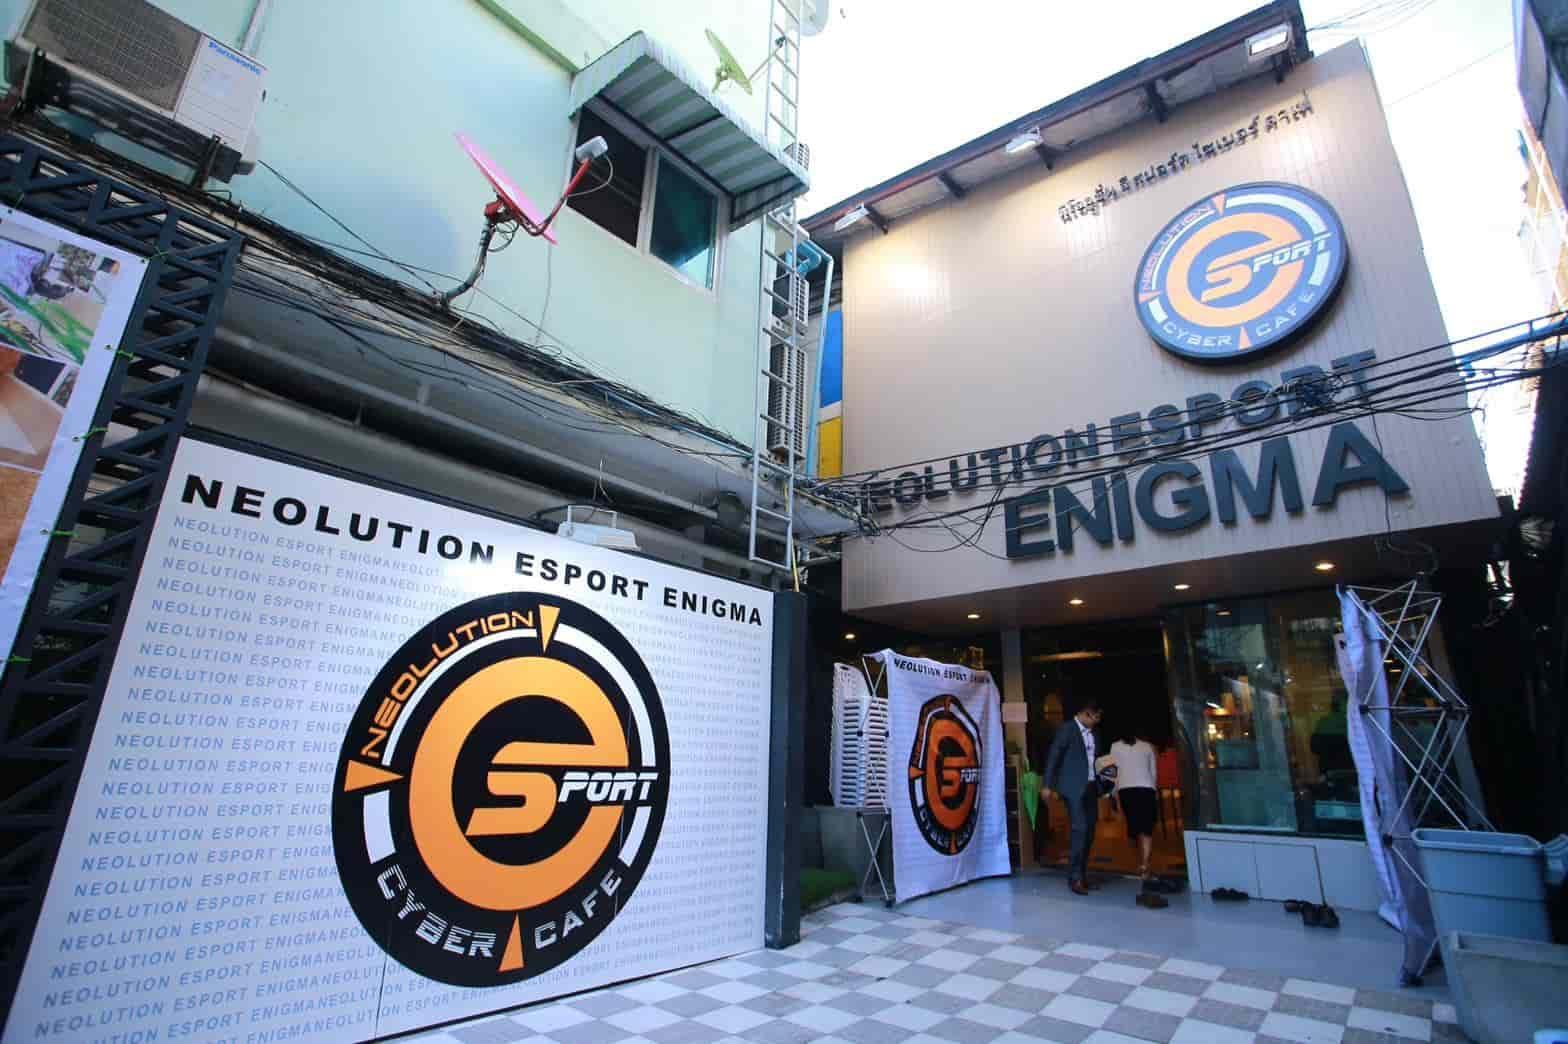 neolution-esport-enigma-cafe